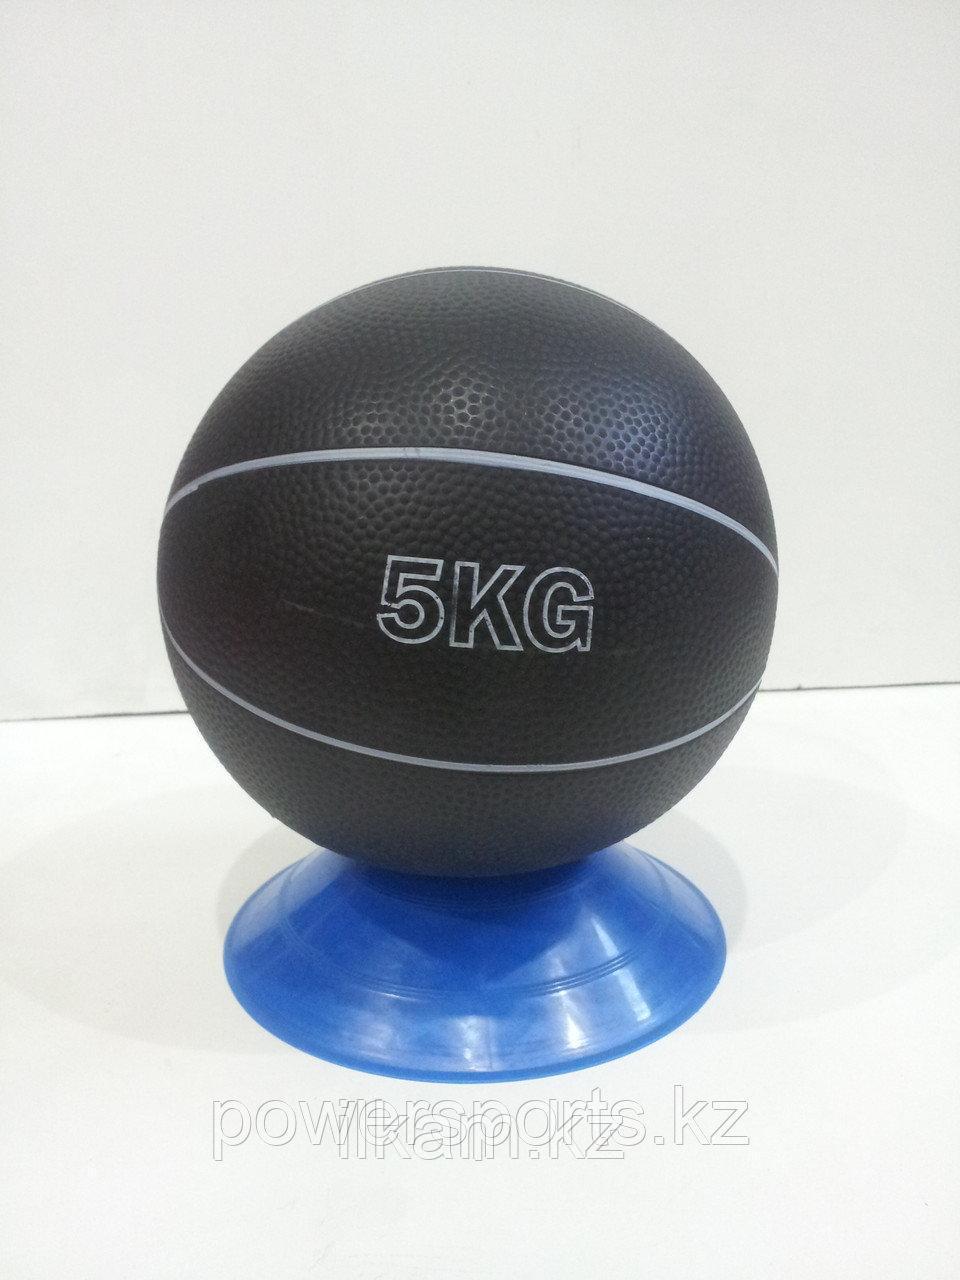 Медбол 5 кг.